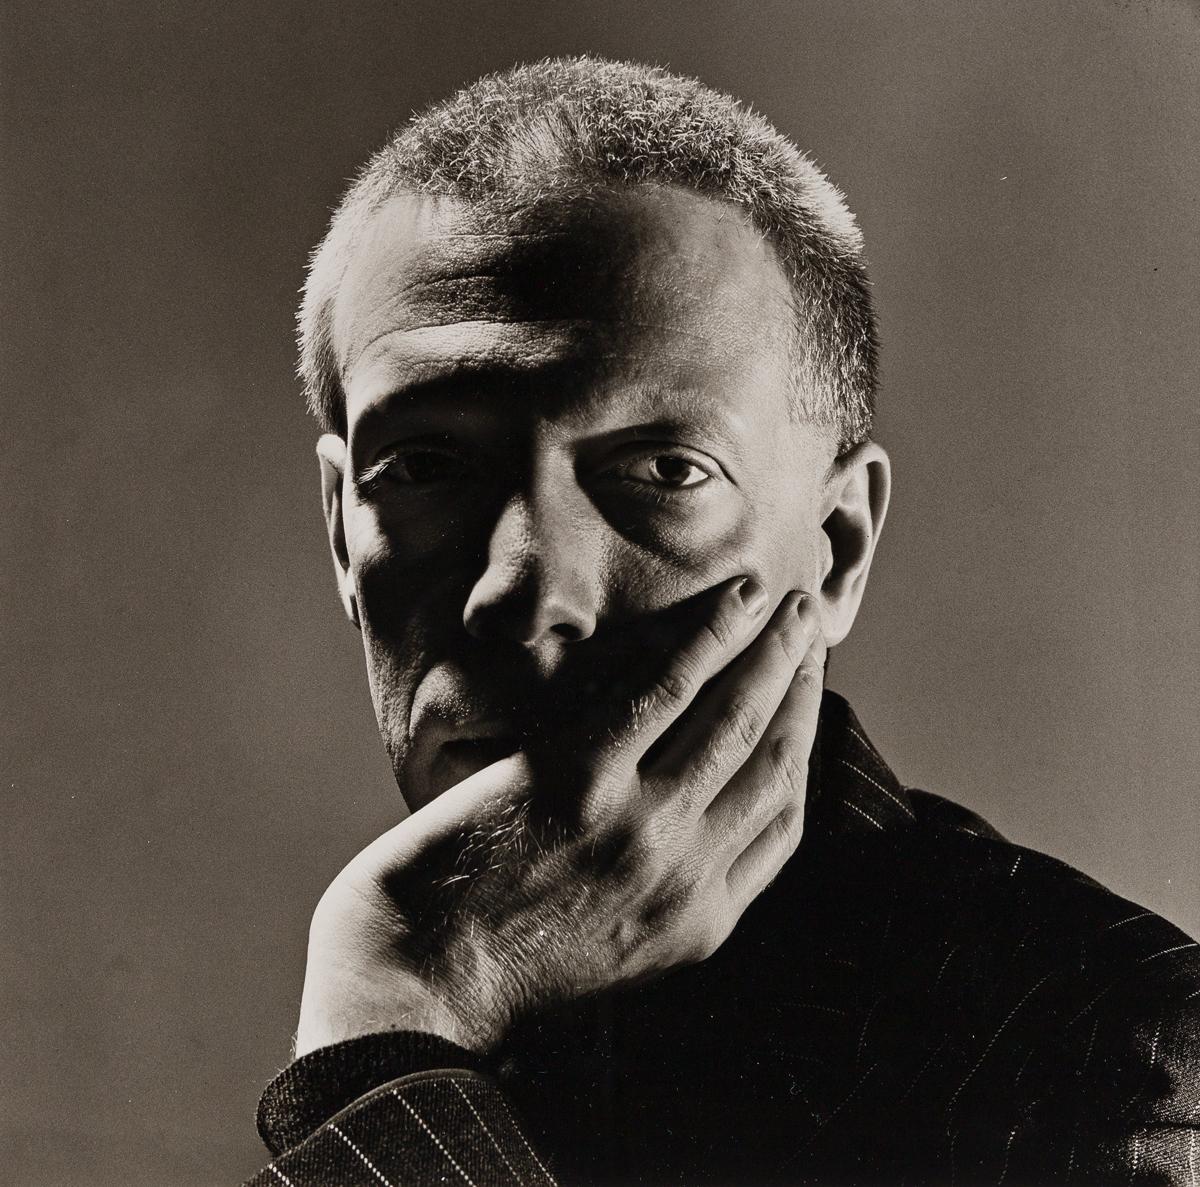 PETER-HUJAR-(1934-1987)-Ethyl-Eichelberger